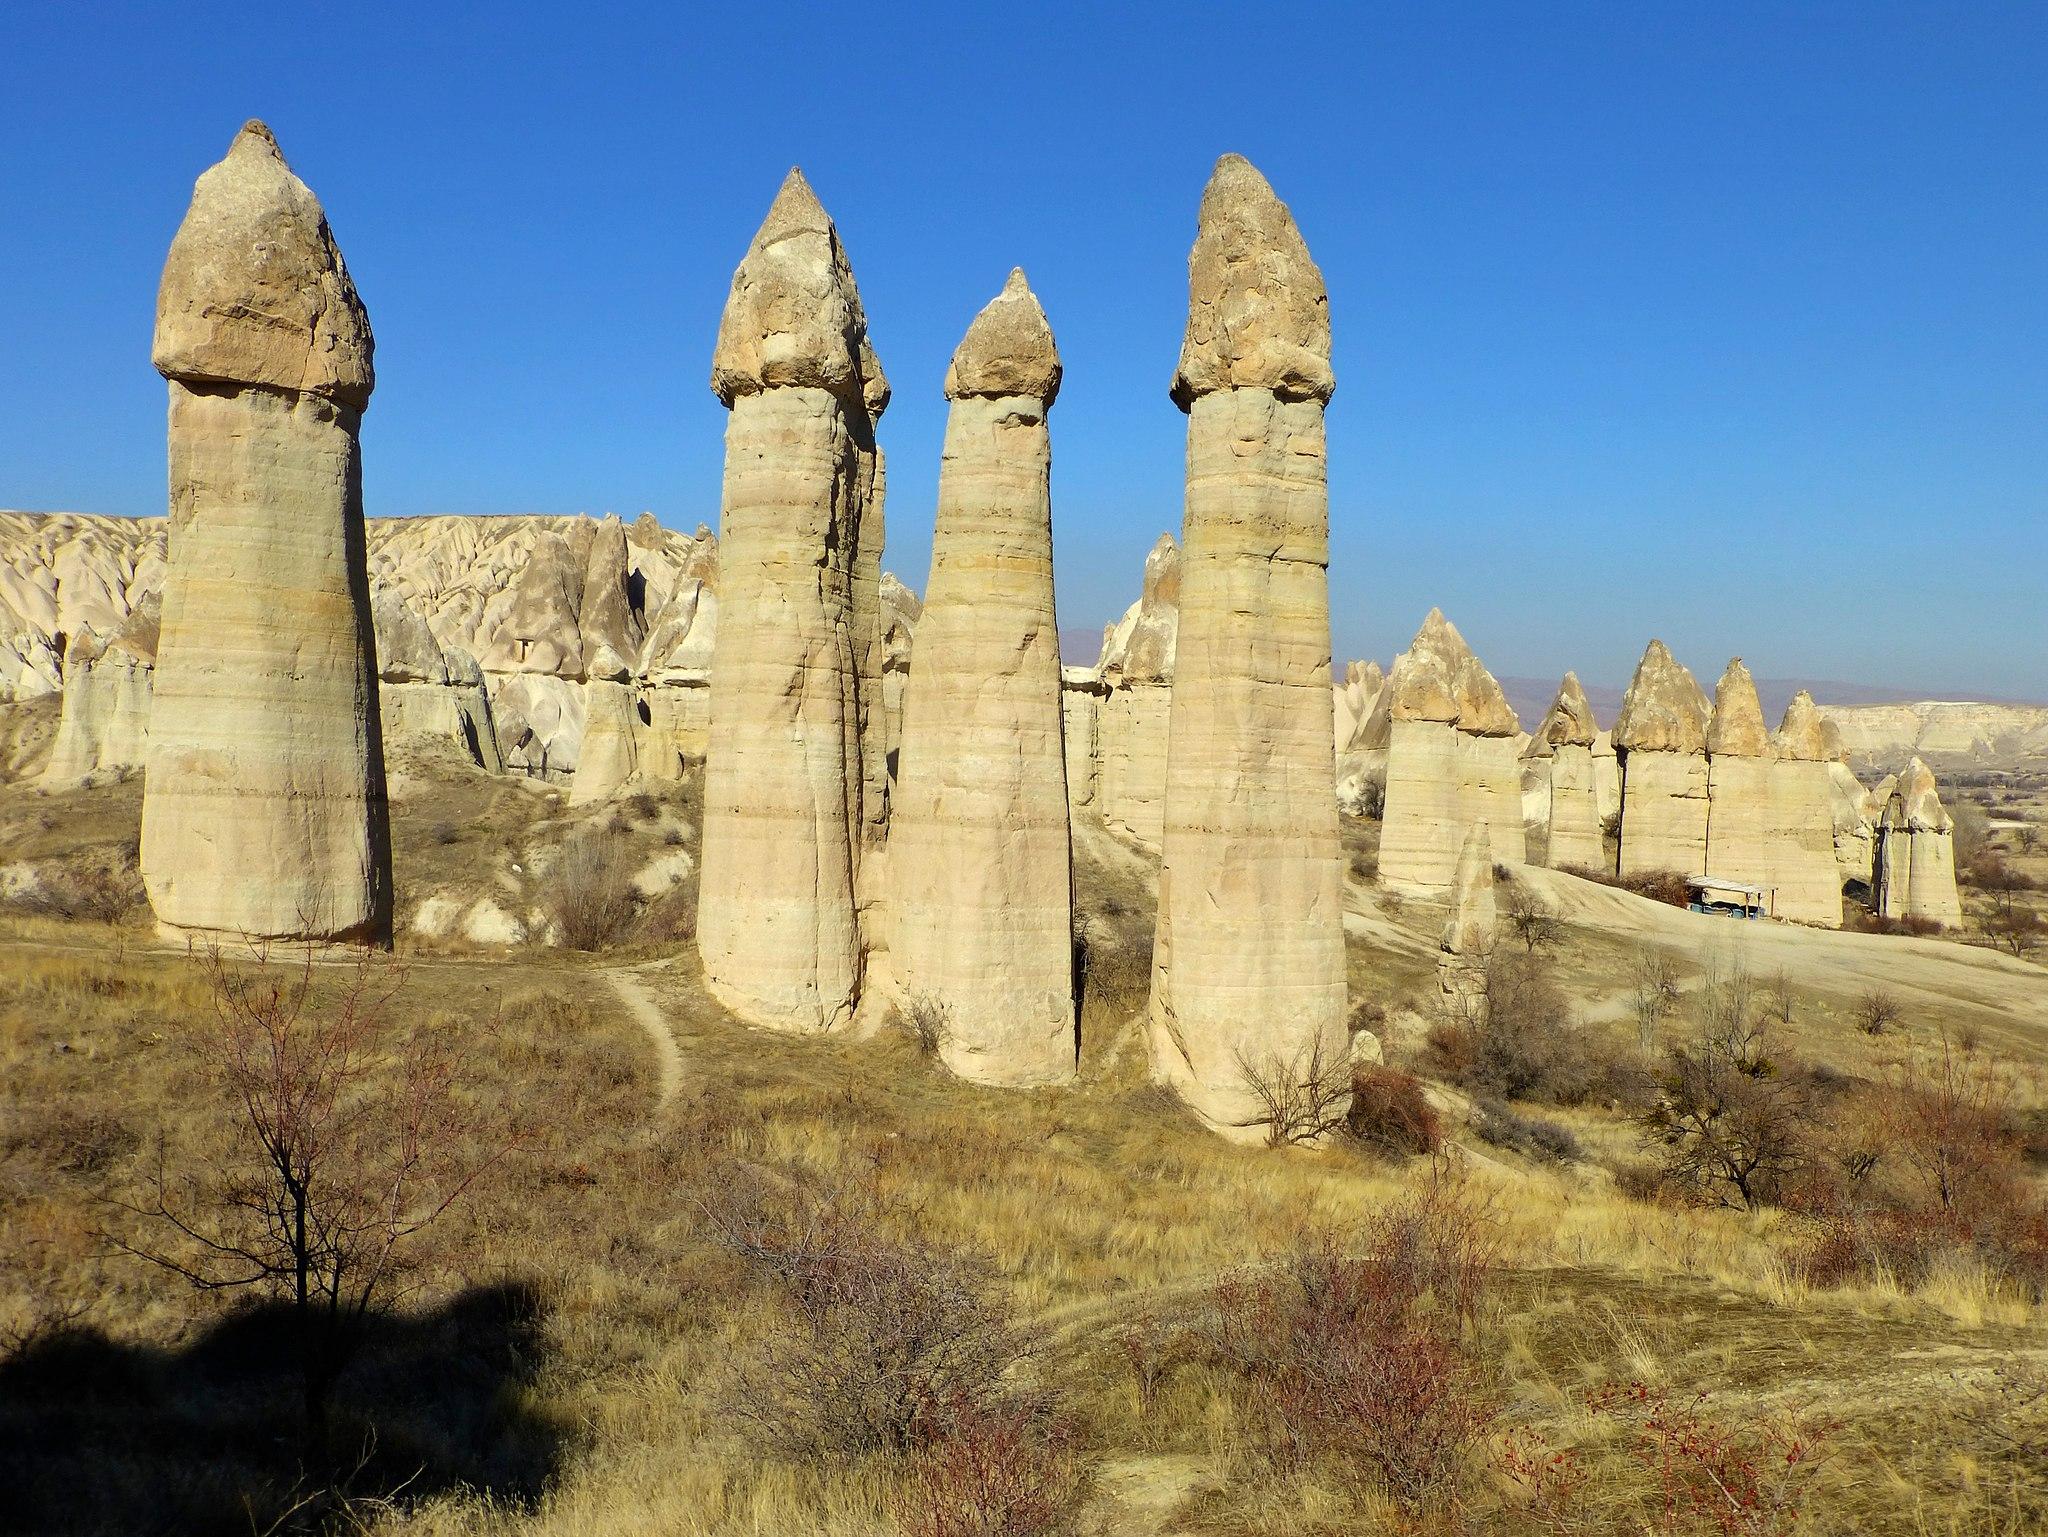 Bagildere Love Valley Cappadocia 1510927 8 9 Compressor HDR lvl Nevit